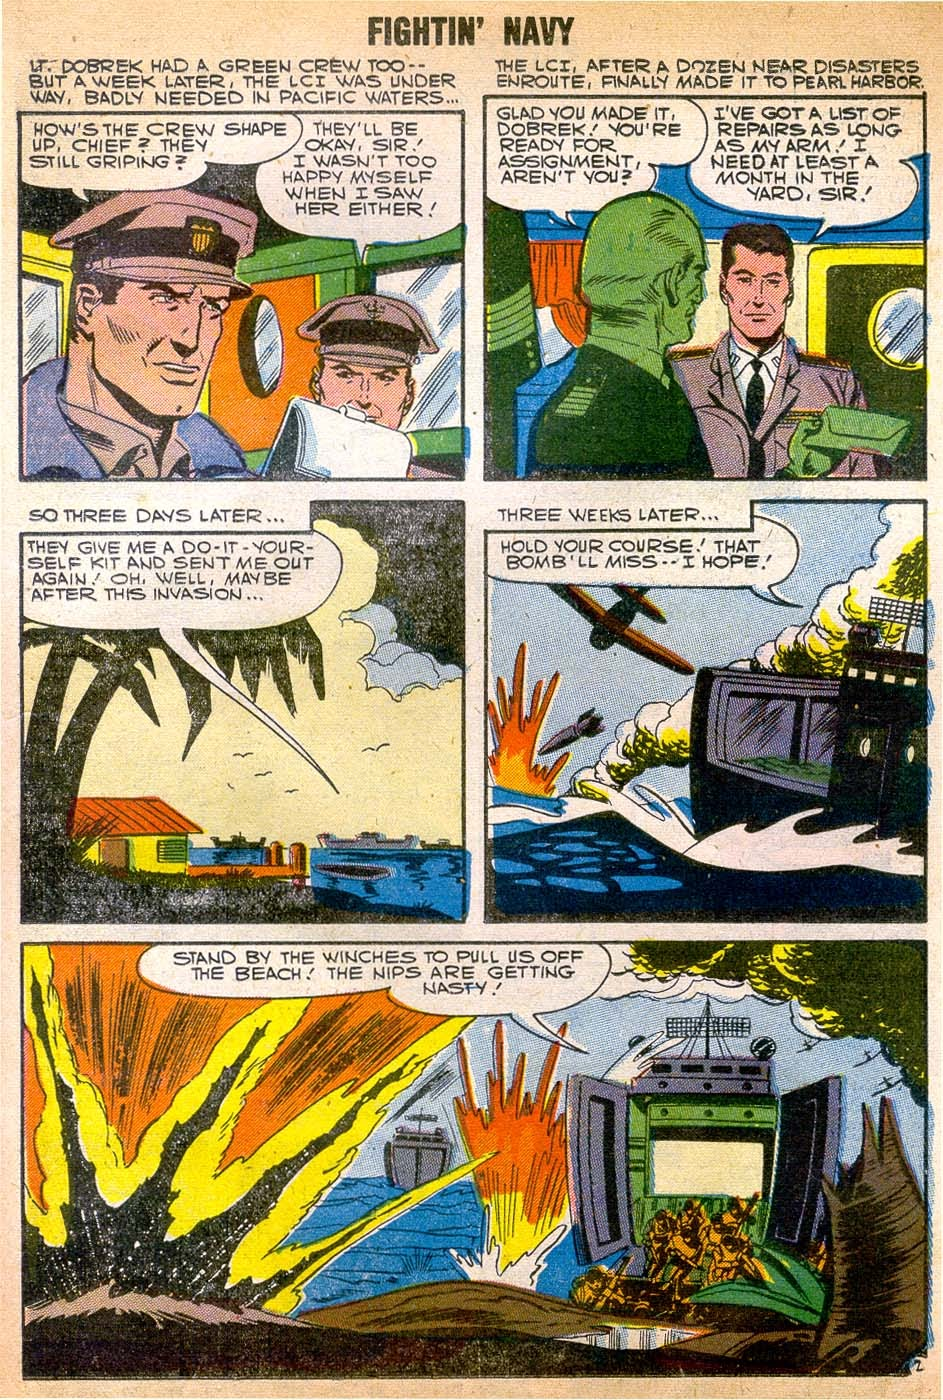 Read online Fightin' Navy comic -  Issue #79 - 23